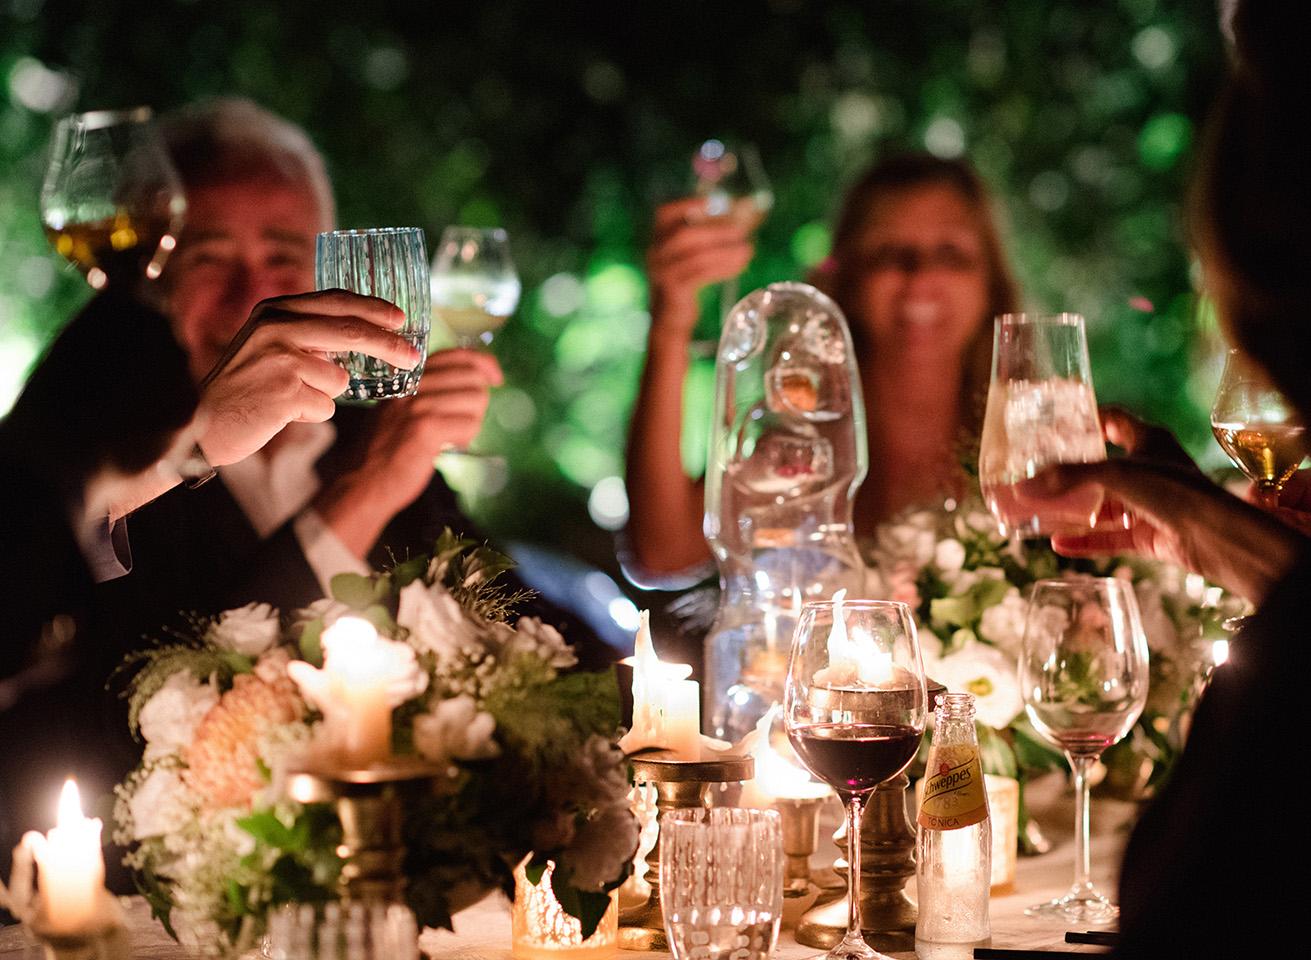 Receptopn Details - Castello Di Casole, Italy - Summer Wedding - Julian Leaver Events